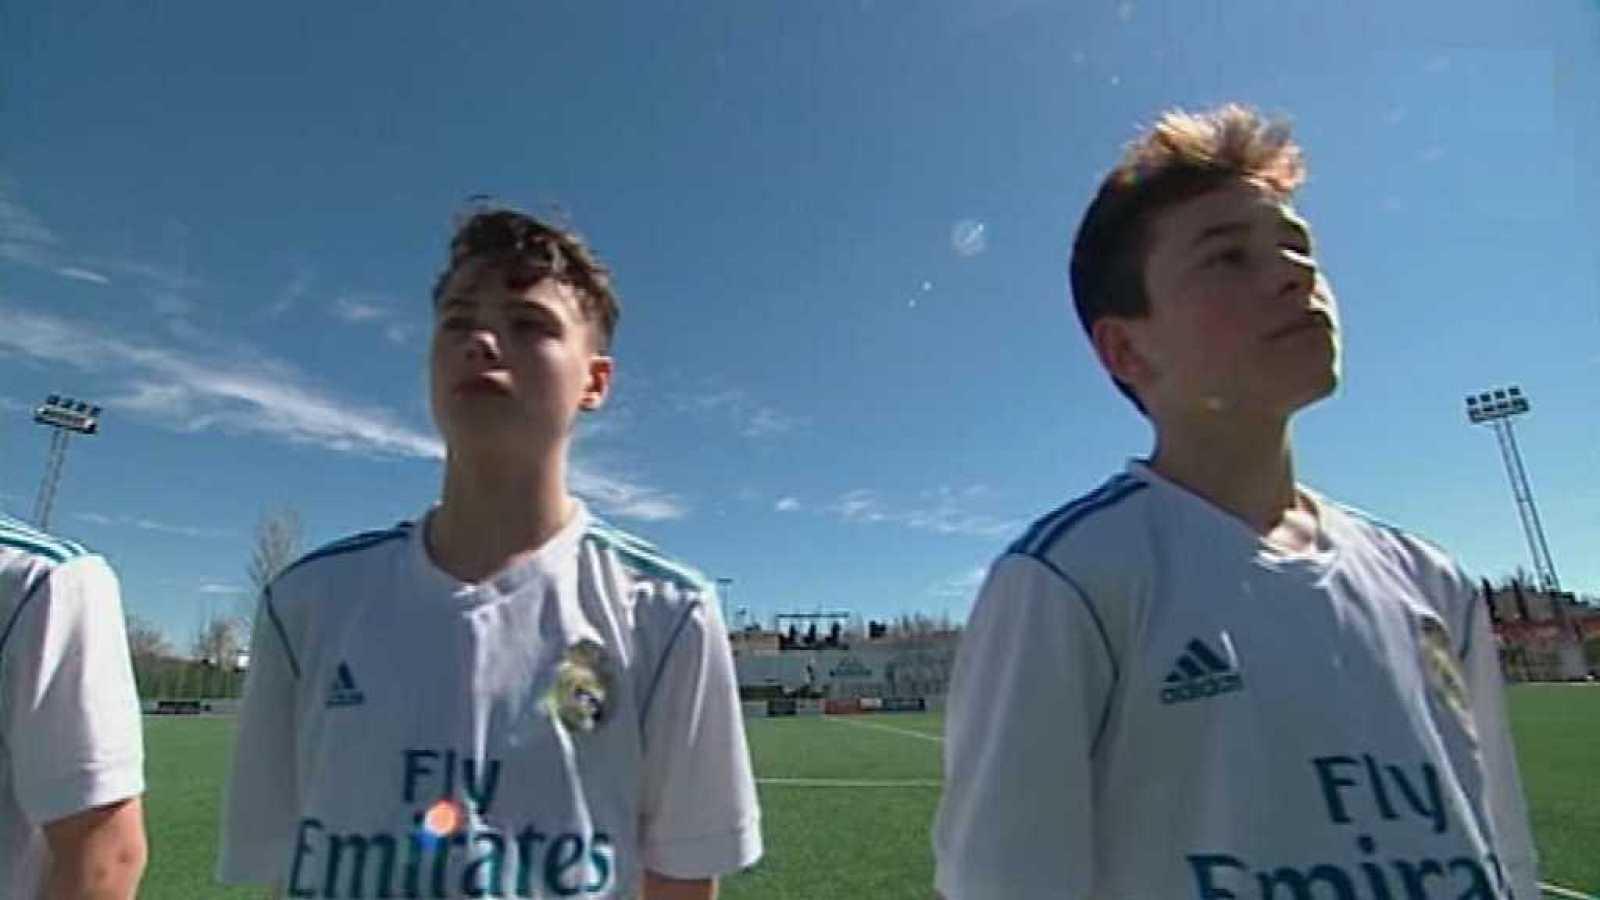 ... uk cheap sale Para todos los públicos Fútbol - Trofeo Ford 2018 Real  Madrid - C.D. ... 86e191824e6